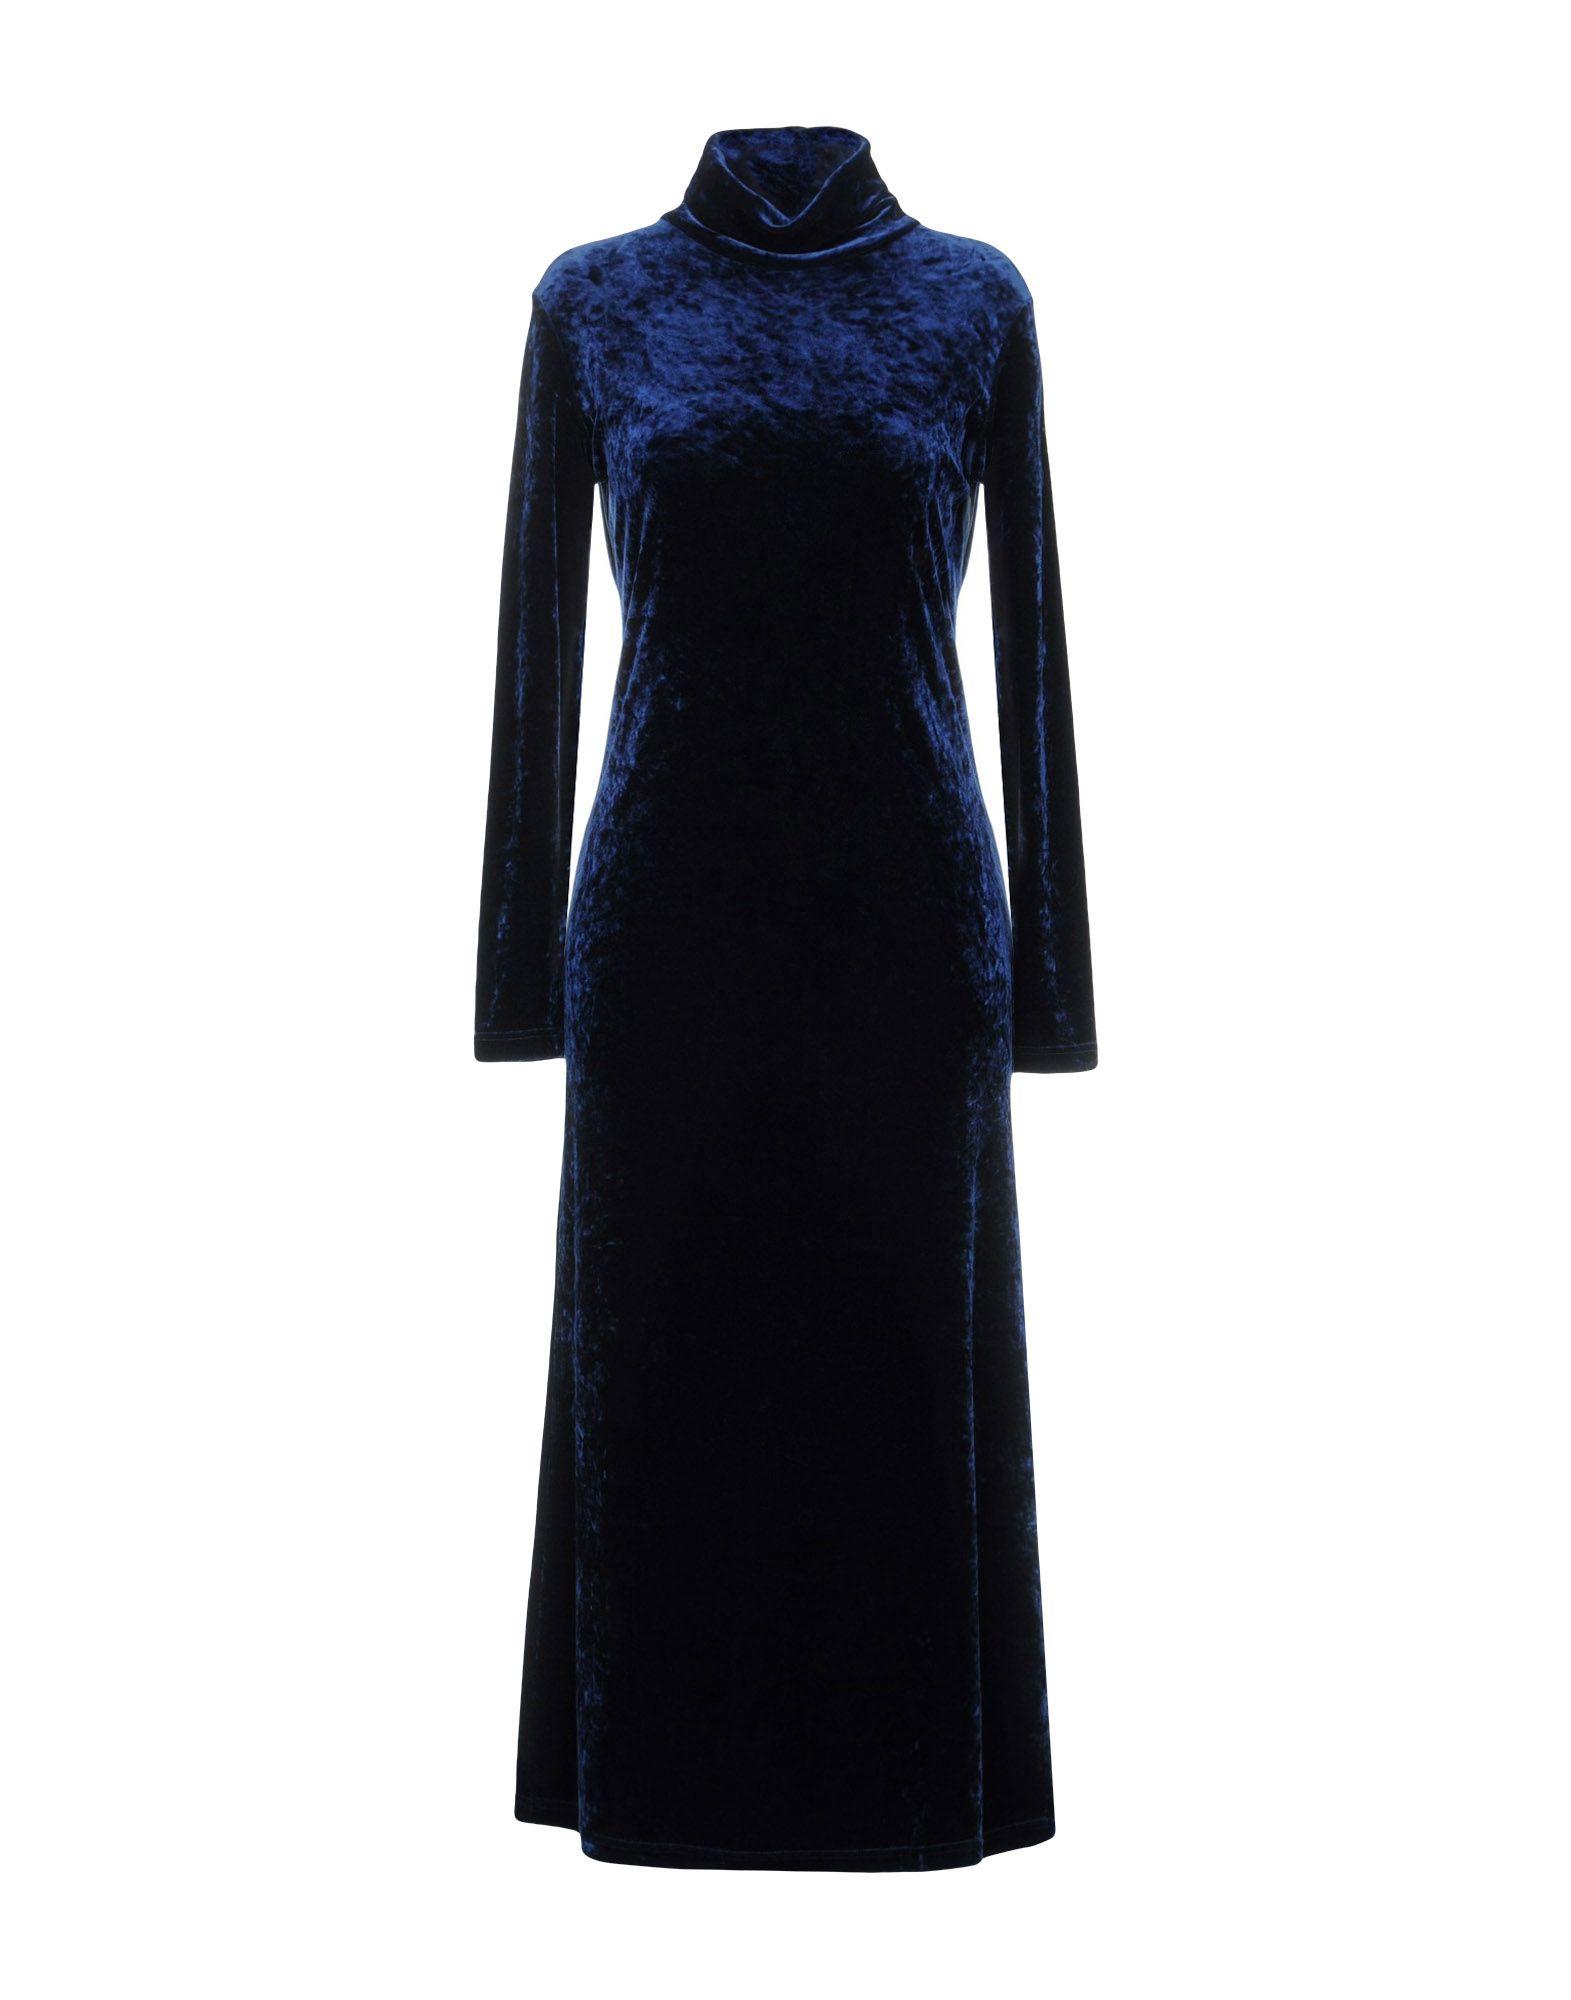 CHARLOTT Платье длиной 3/4 bonpoint платье charlott с принтом